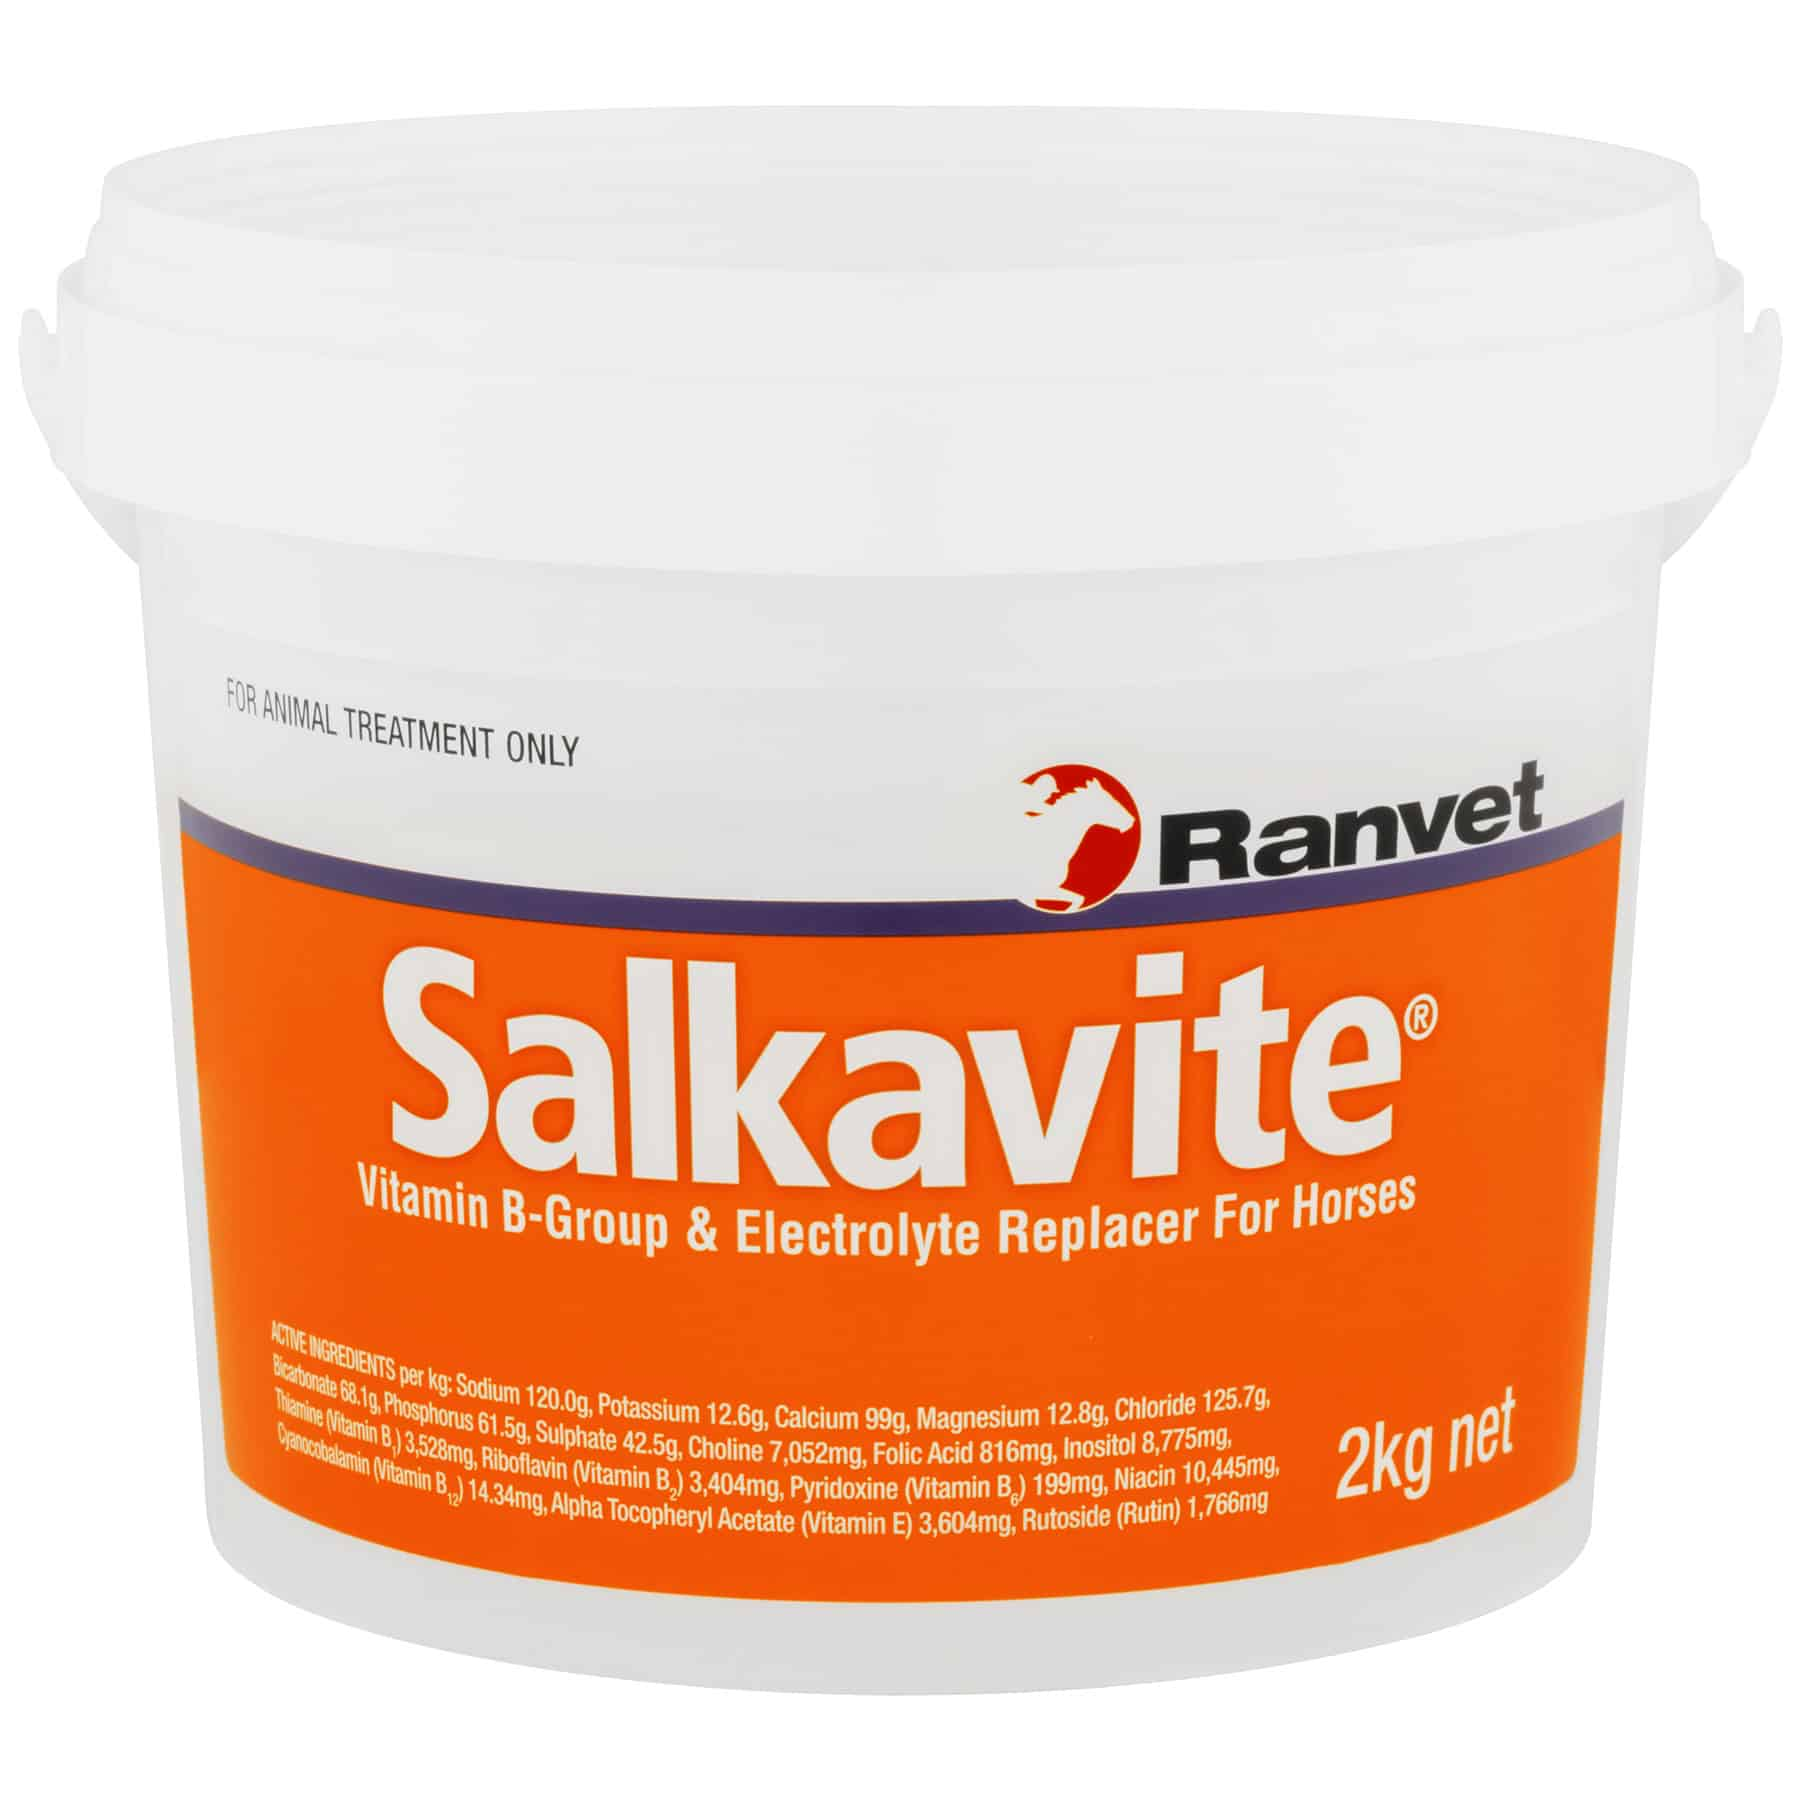 Salkavite 2kg at Bowral Coop